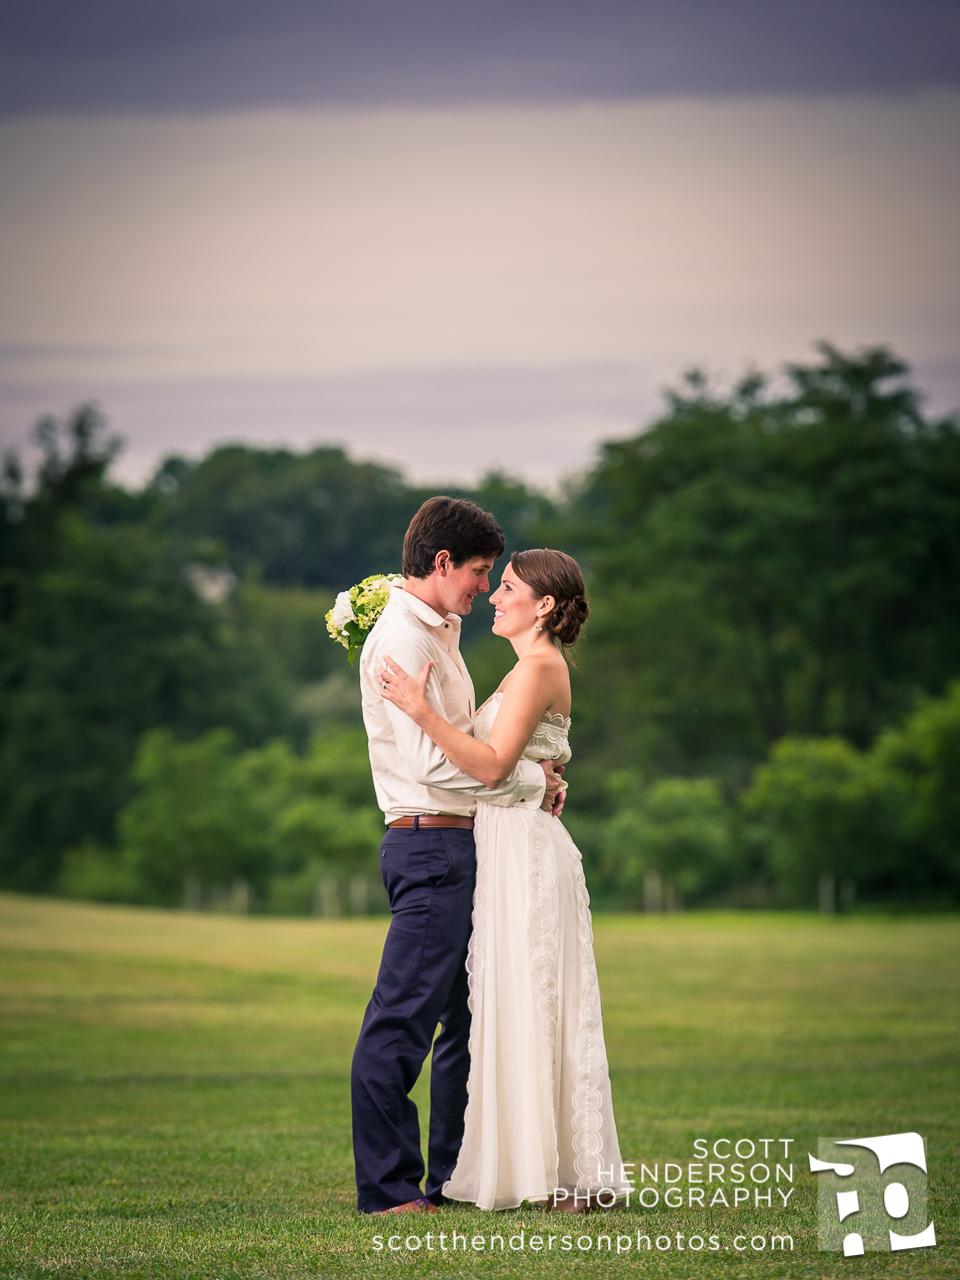 yearinreview-wedding-008.jpg